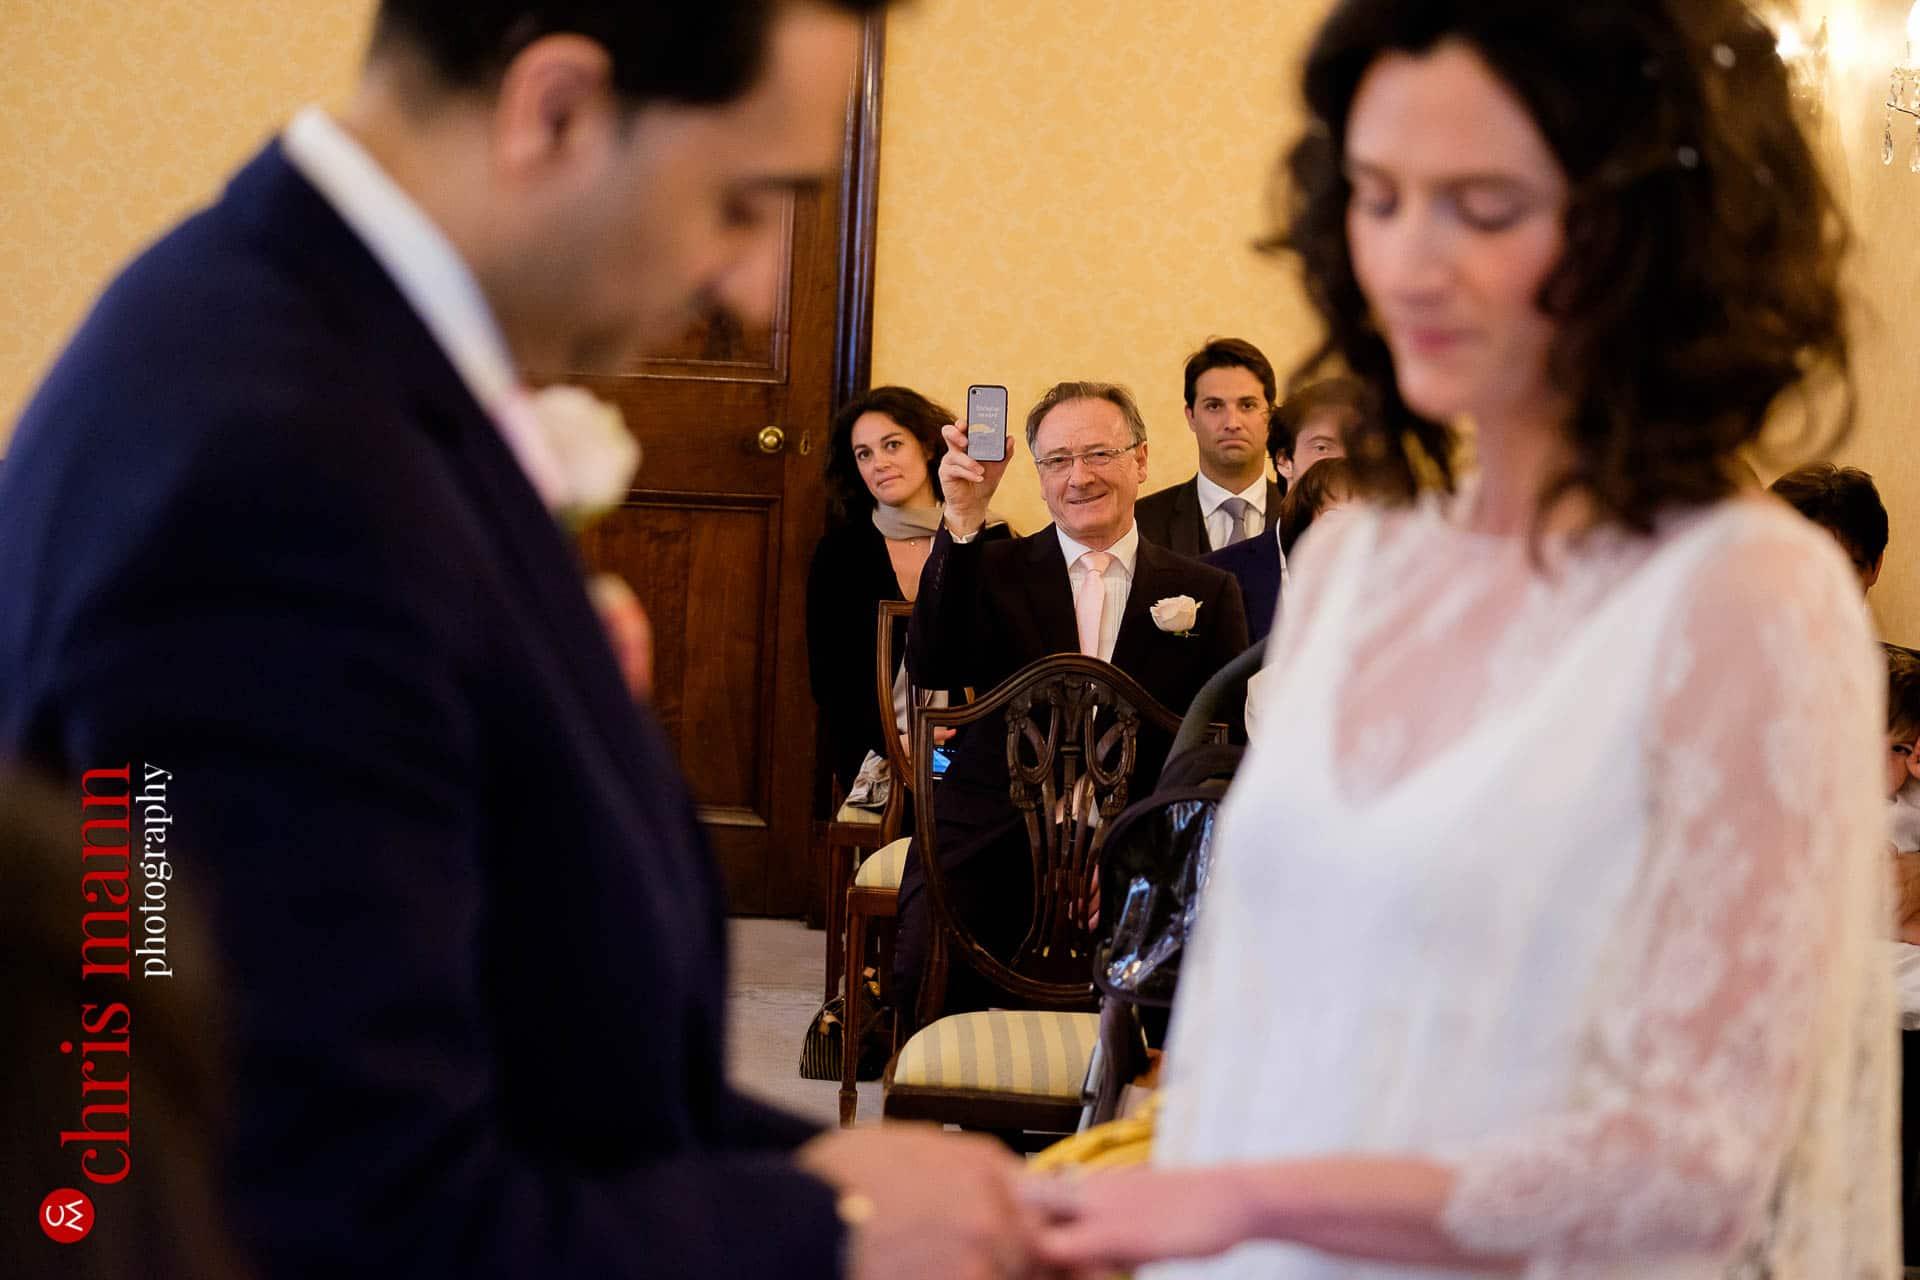 Chelsea-registry-office-wedding-017